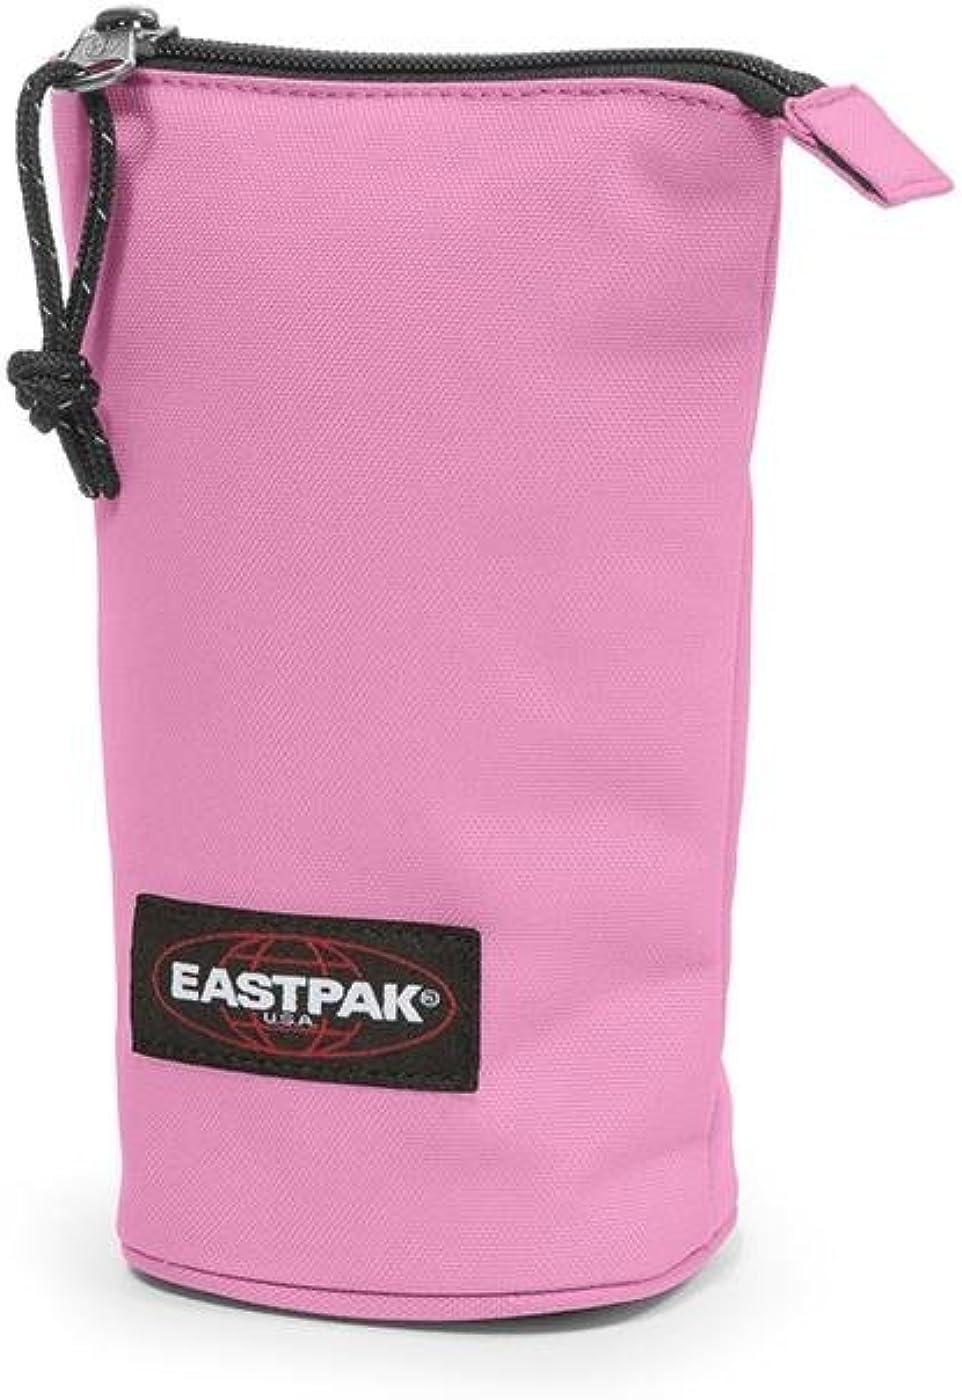 Eastpak Estuche Oval UP Coupled PInk EK82C 82P: Amazon.es: Ropa y accesorios